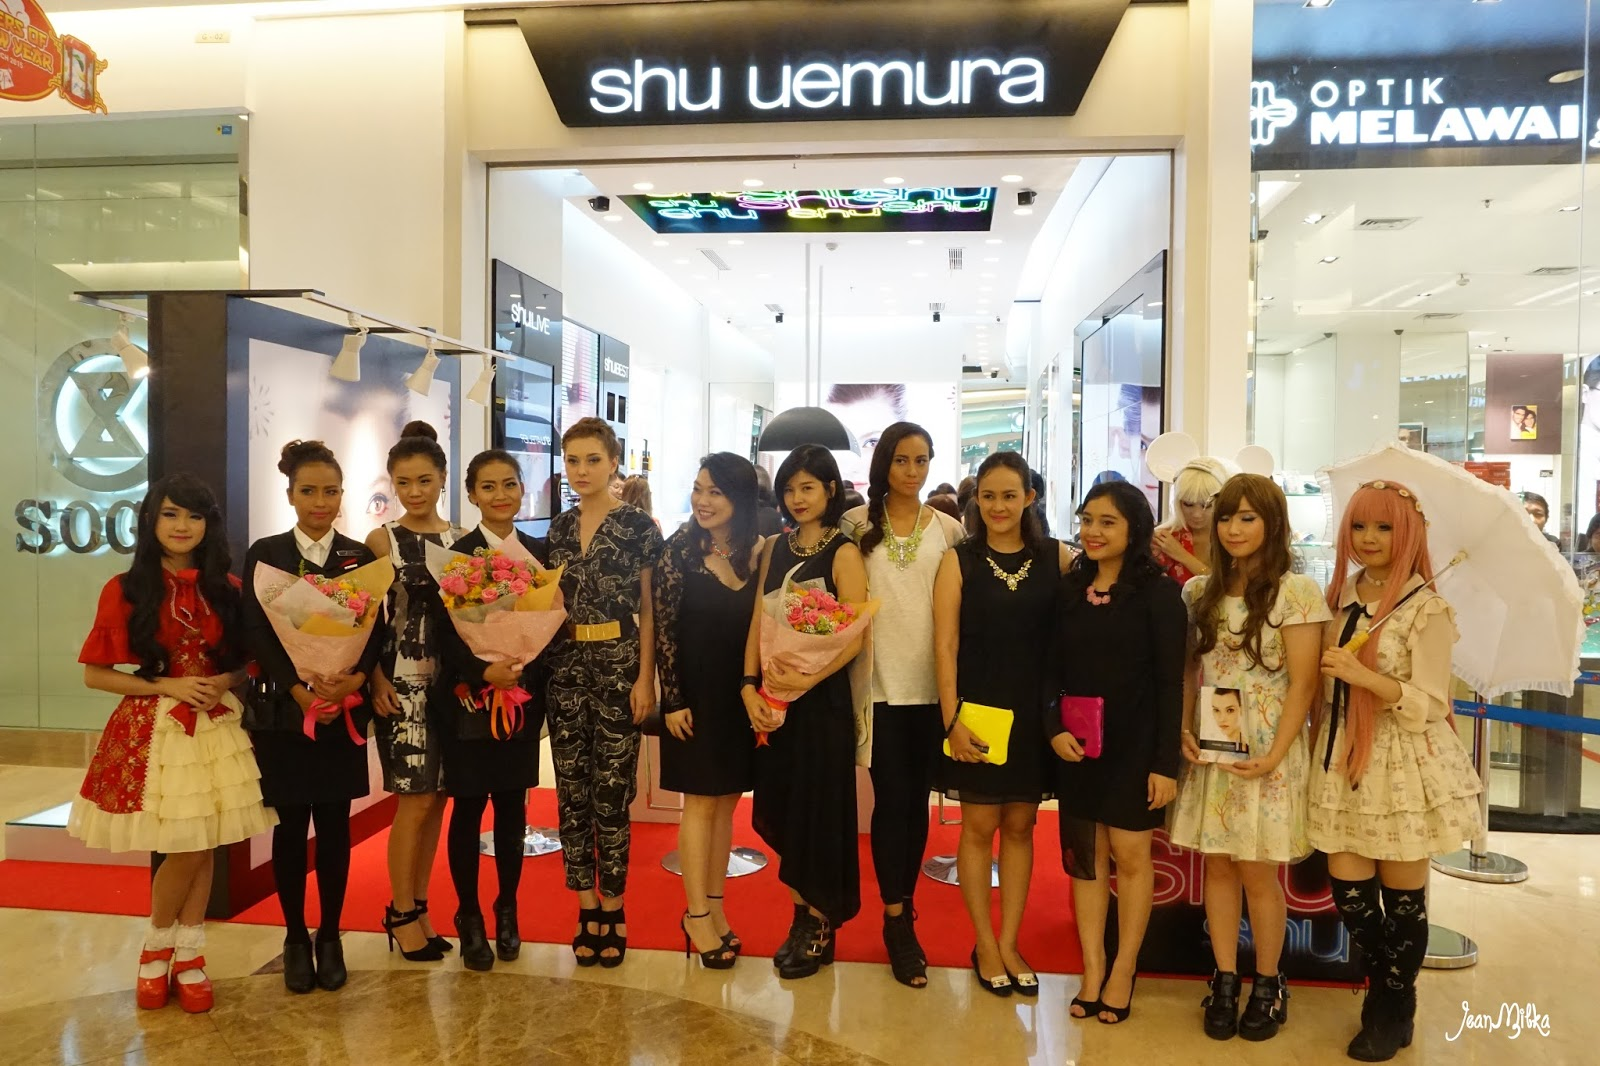 shu uemura, beauty event, new store, event report